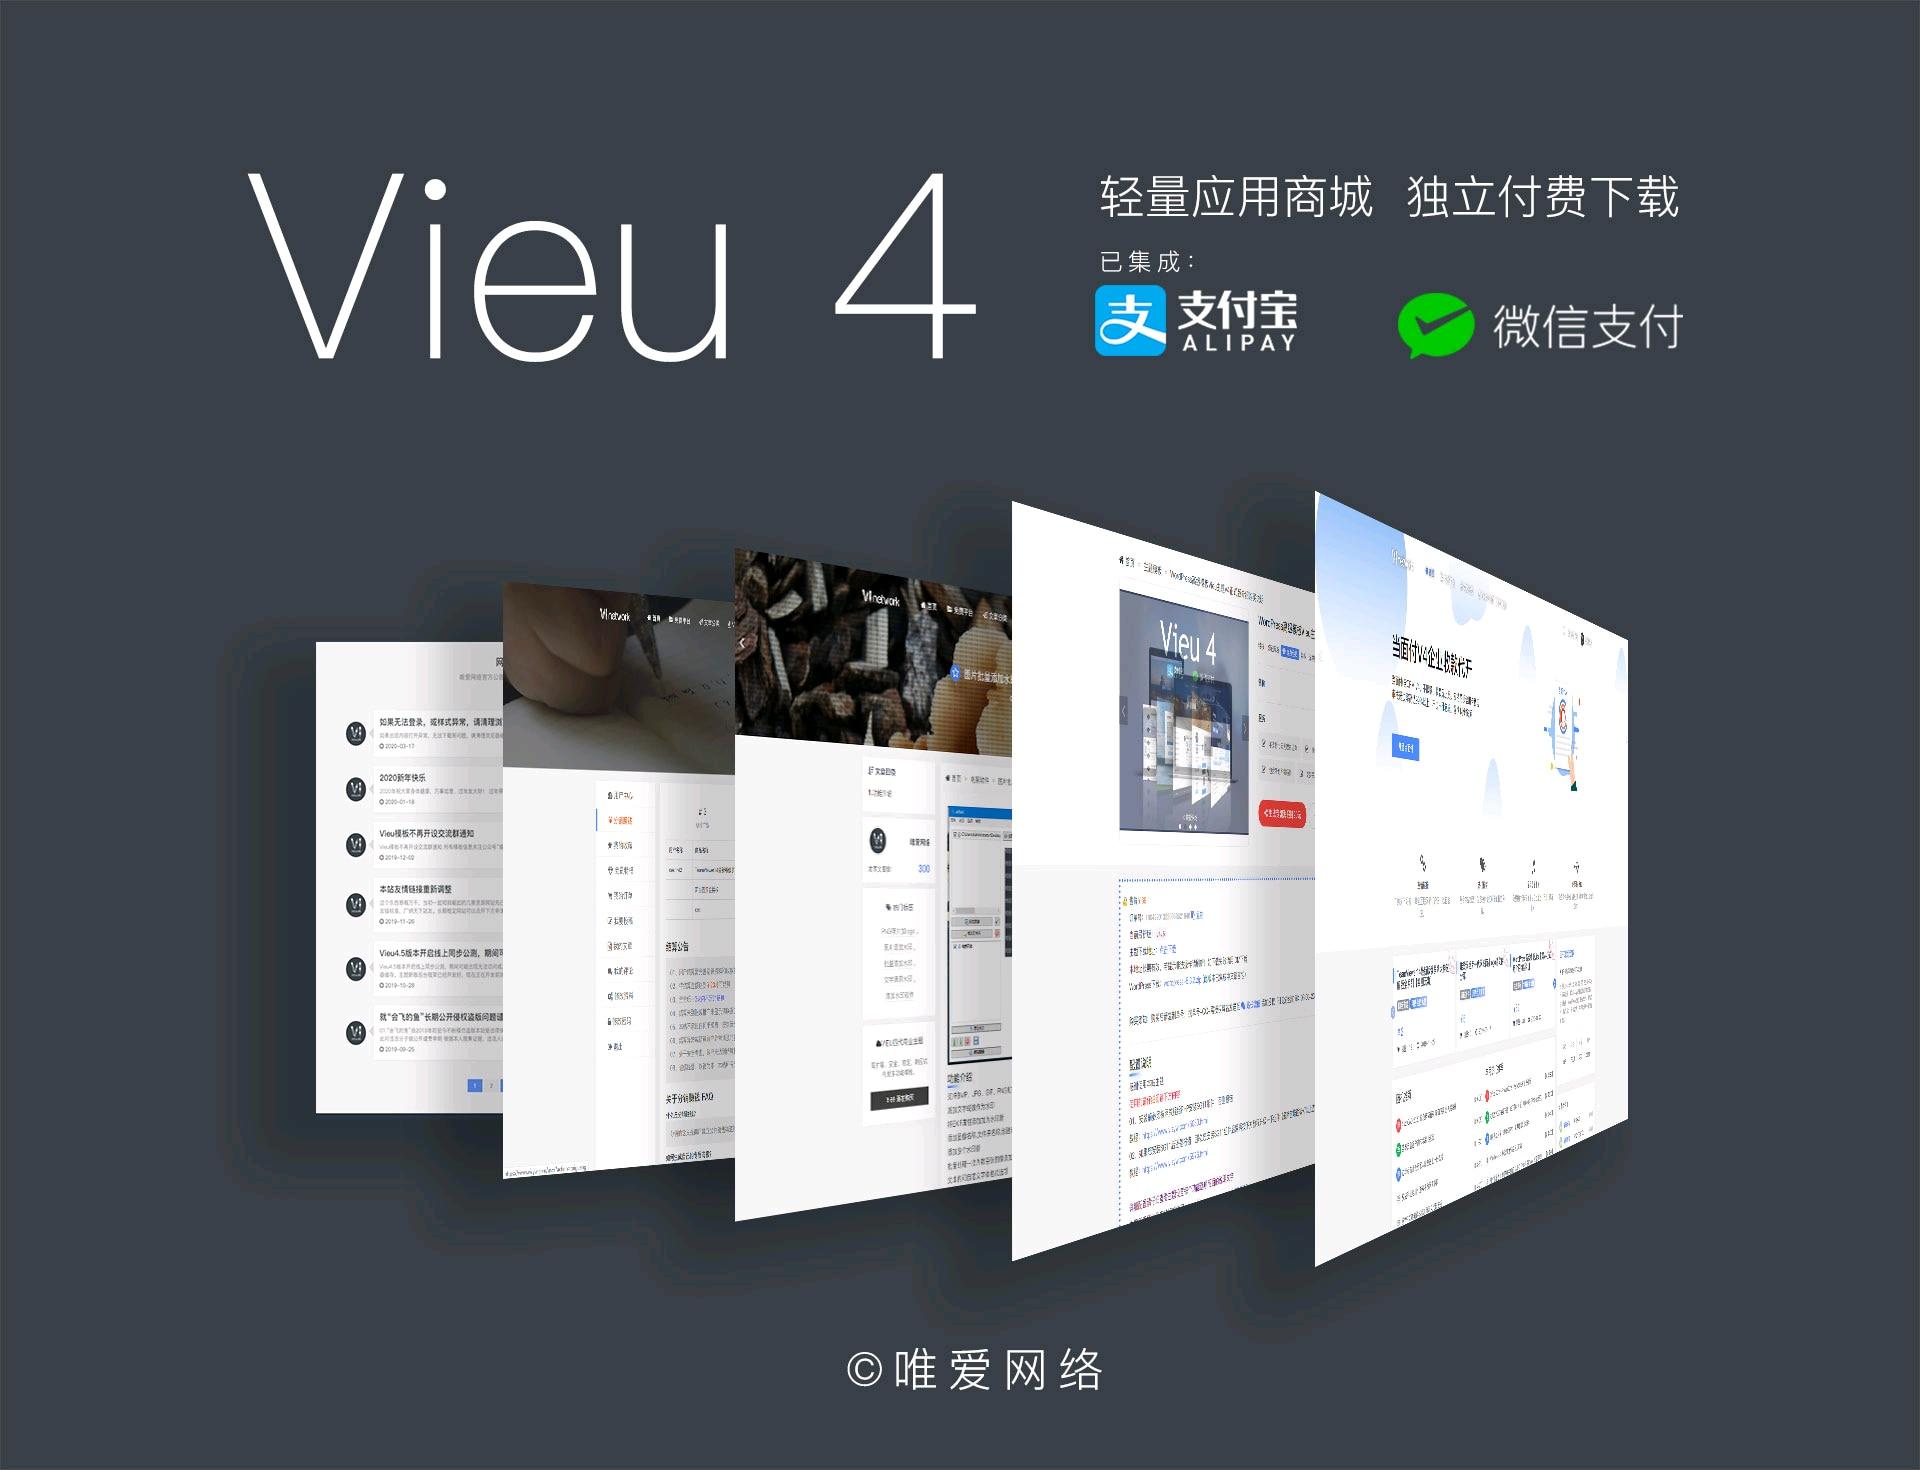 WordPress模板:Vieu主题V4介绍购买(V4.6新增商品推广分销功能)